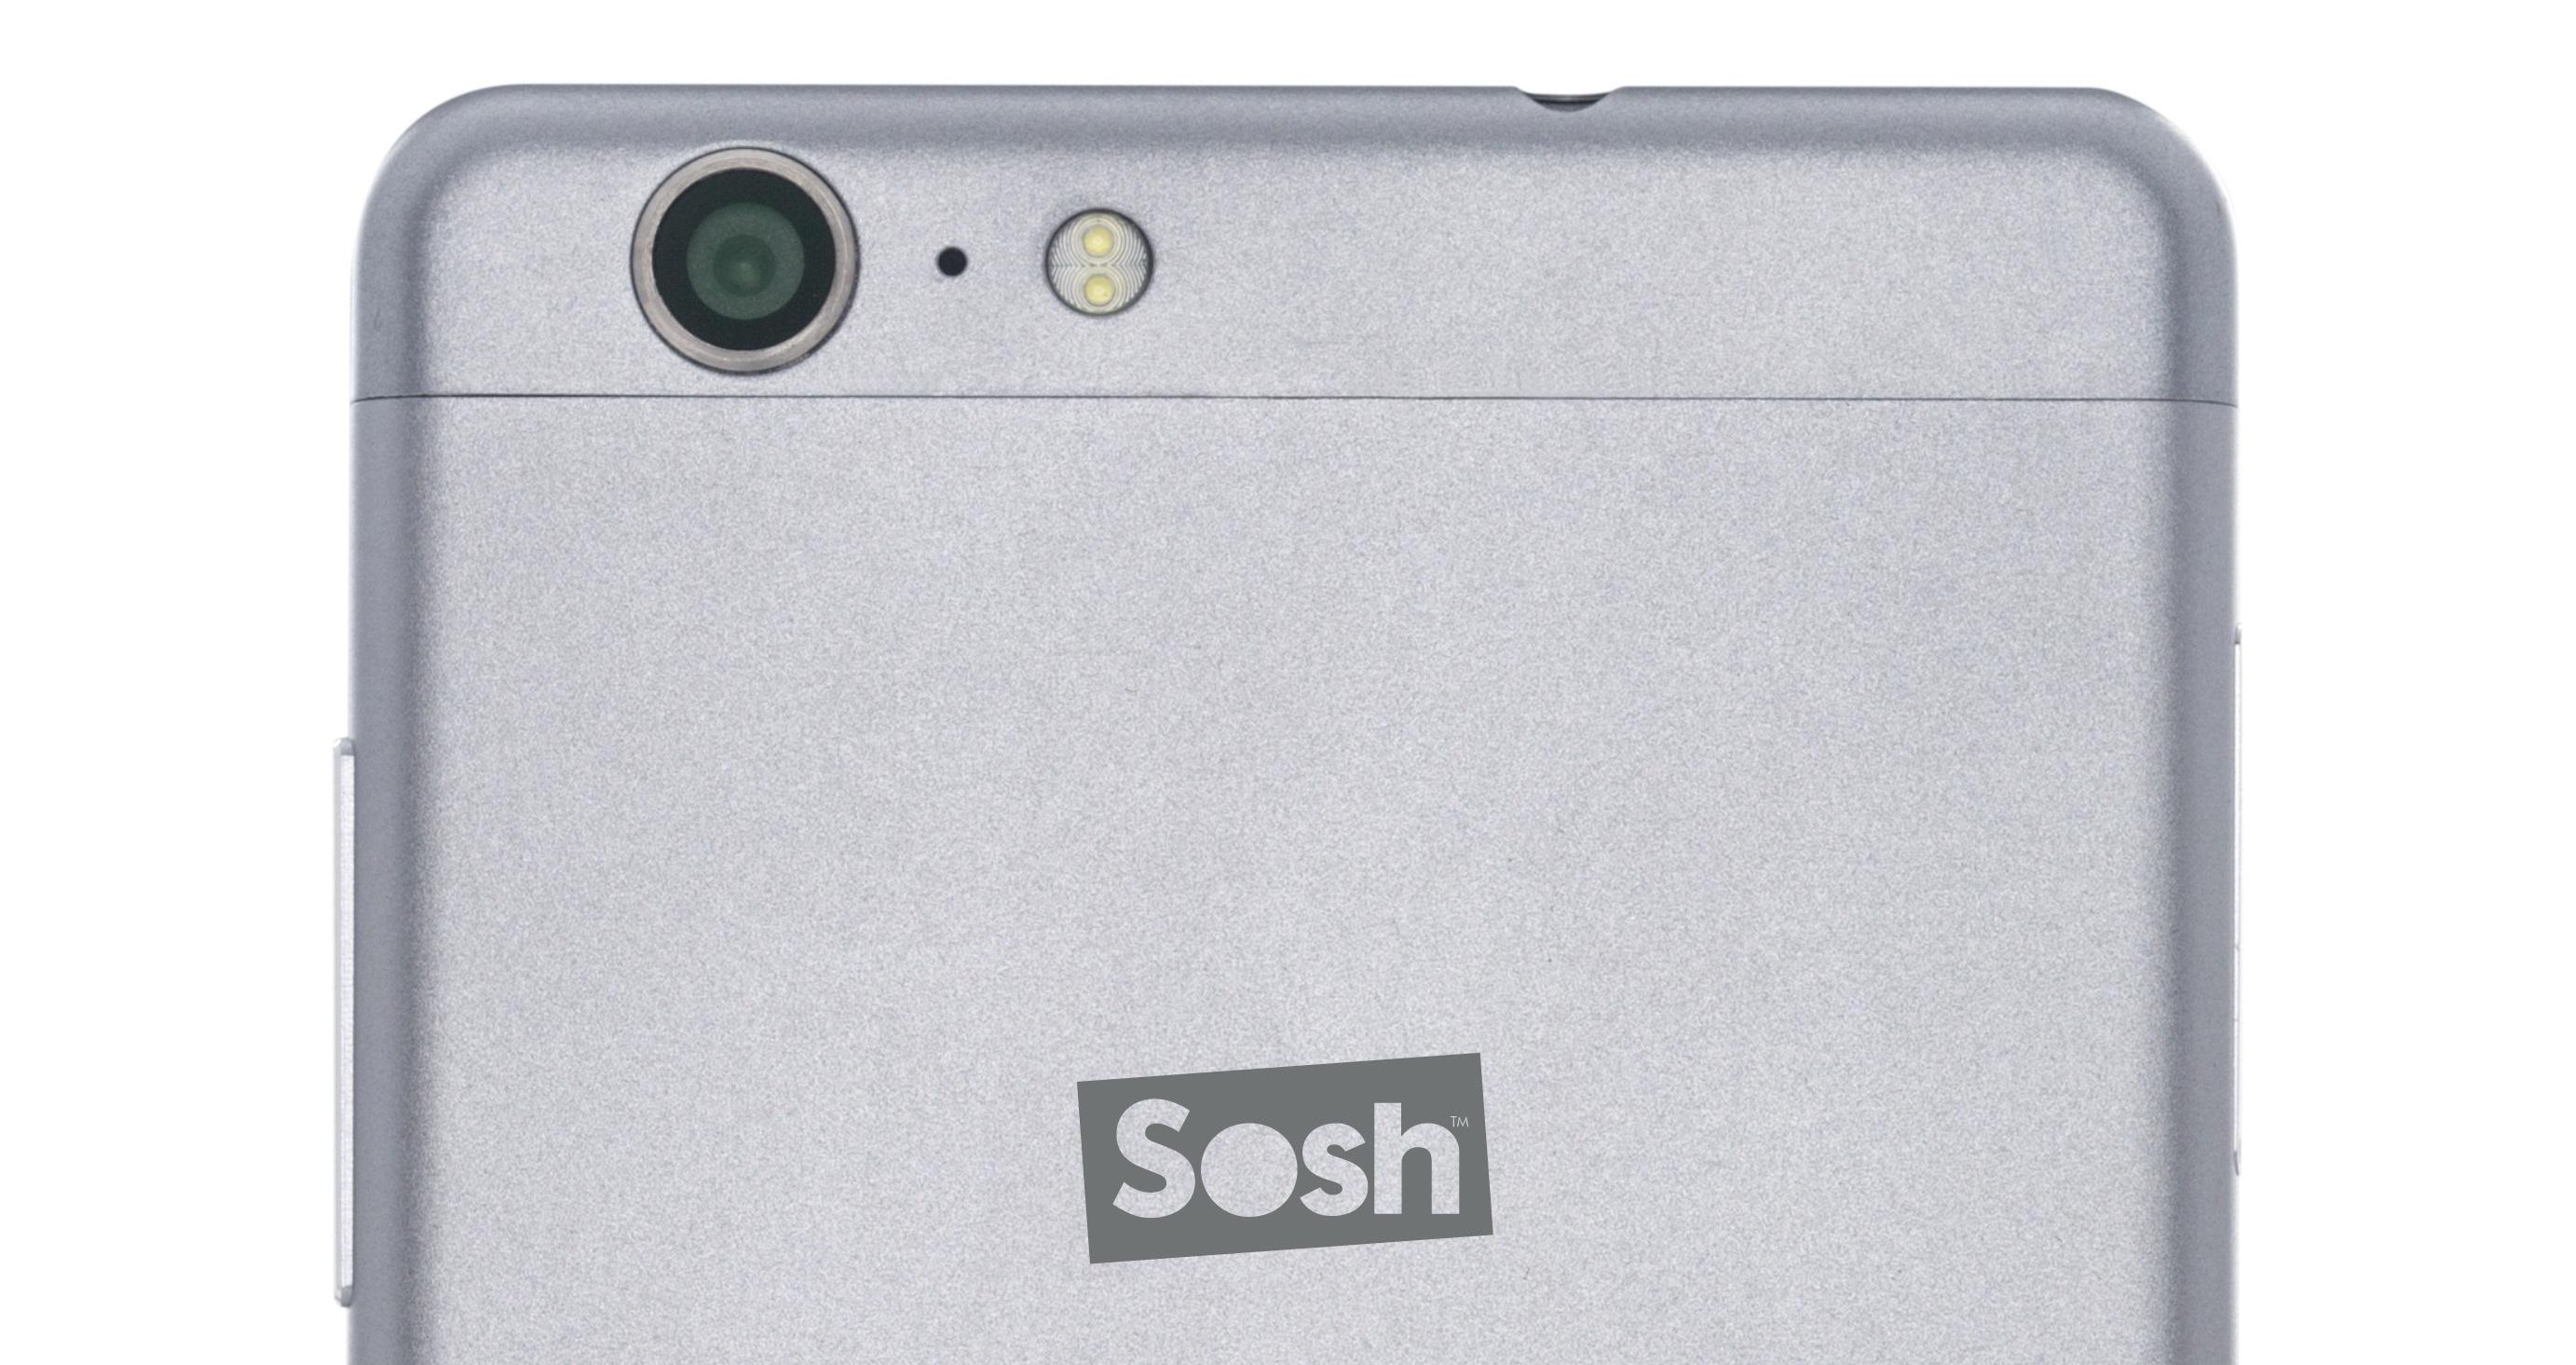 SoshPhone 3 Dos1.jpg